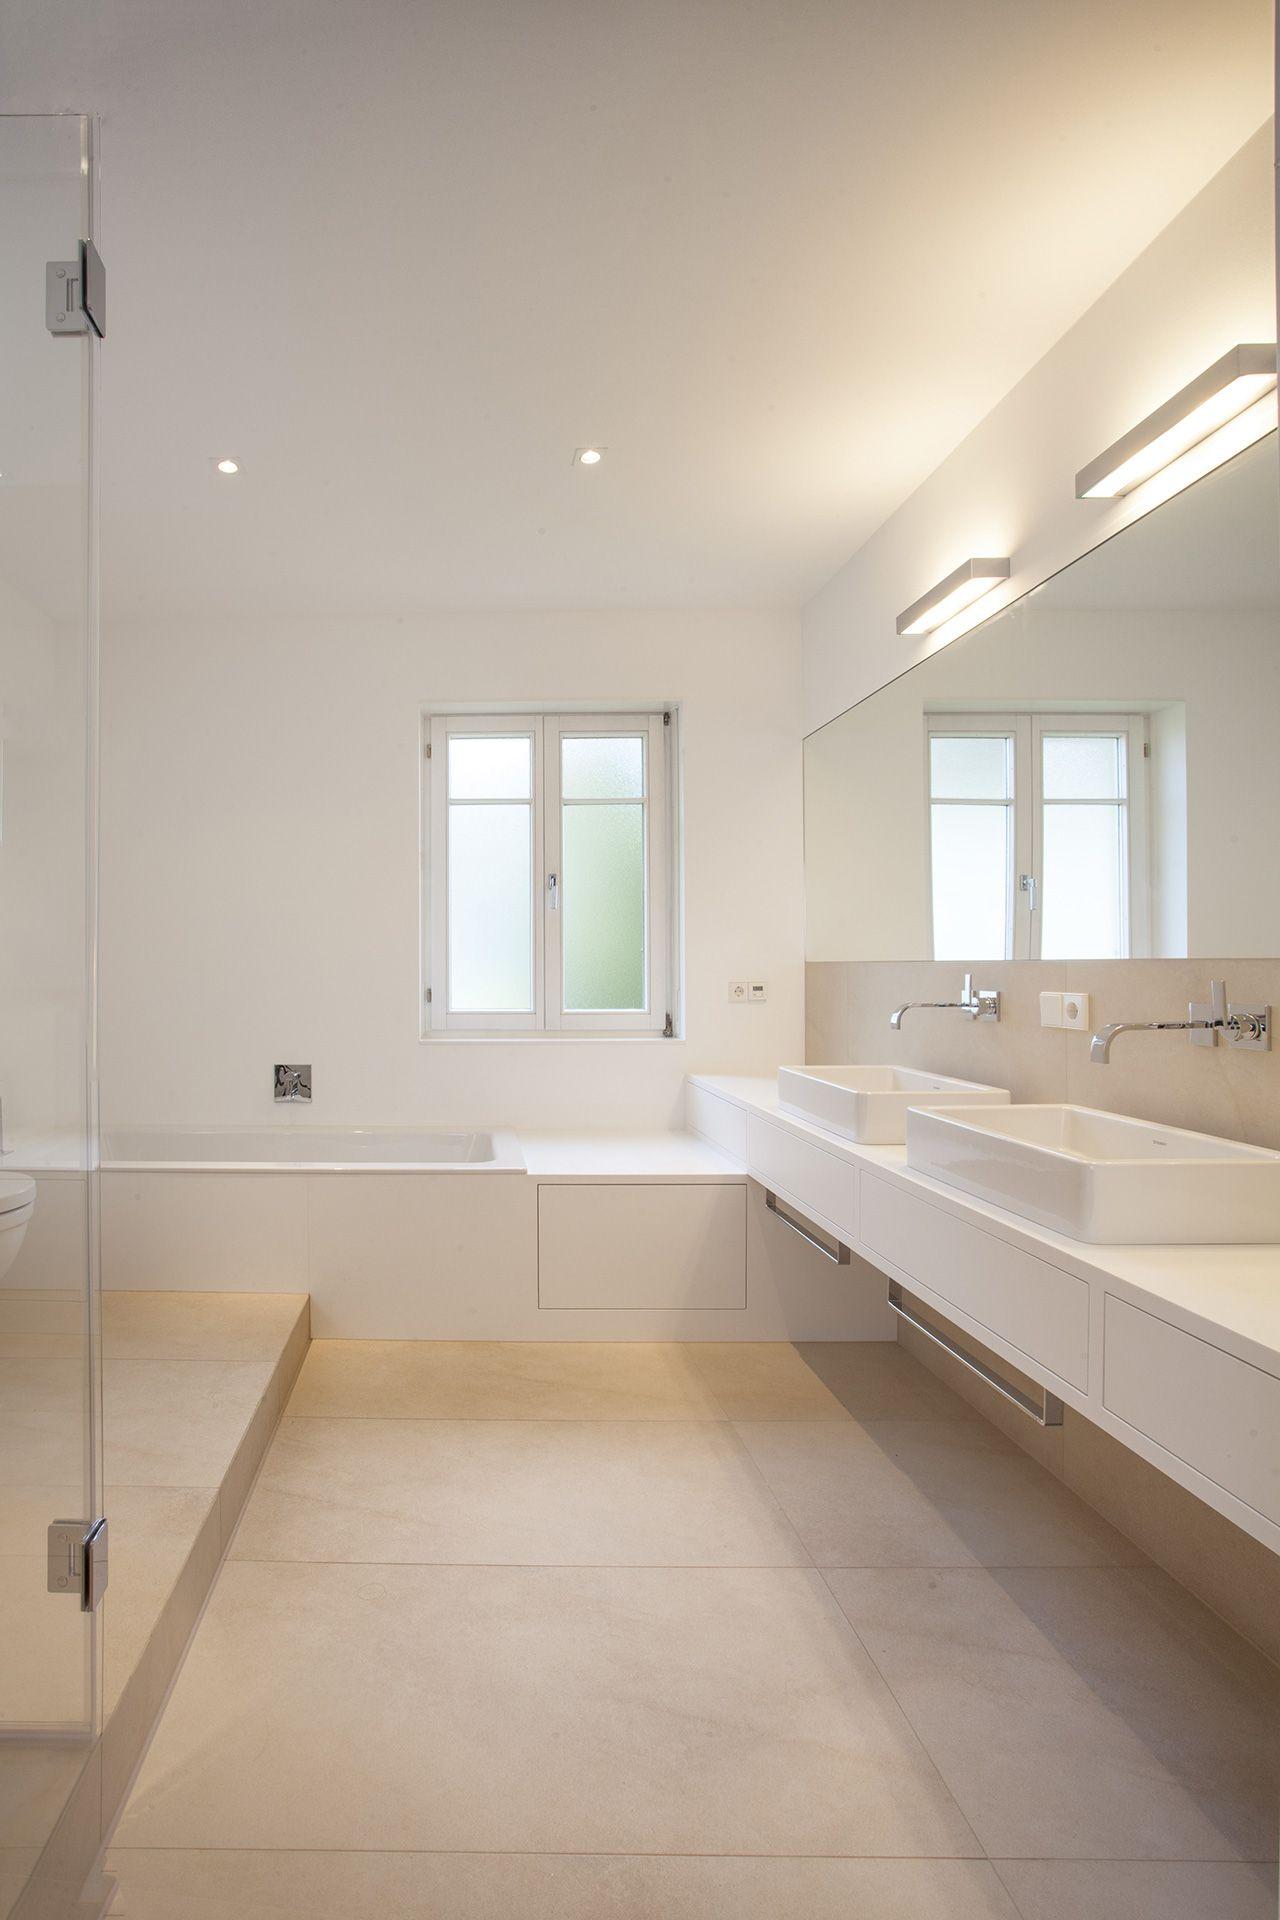 Mtb Badmobel In Mineralwerkstoff Weiss Badezimmer Beige Badezimmer Modernes Badezimmerdesign